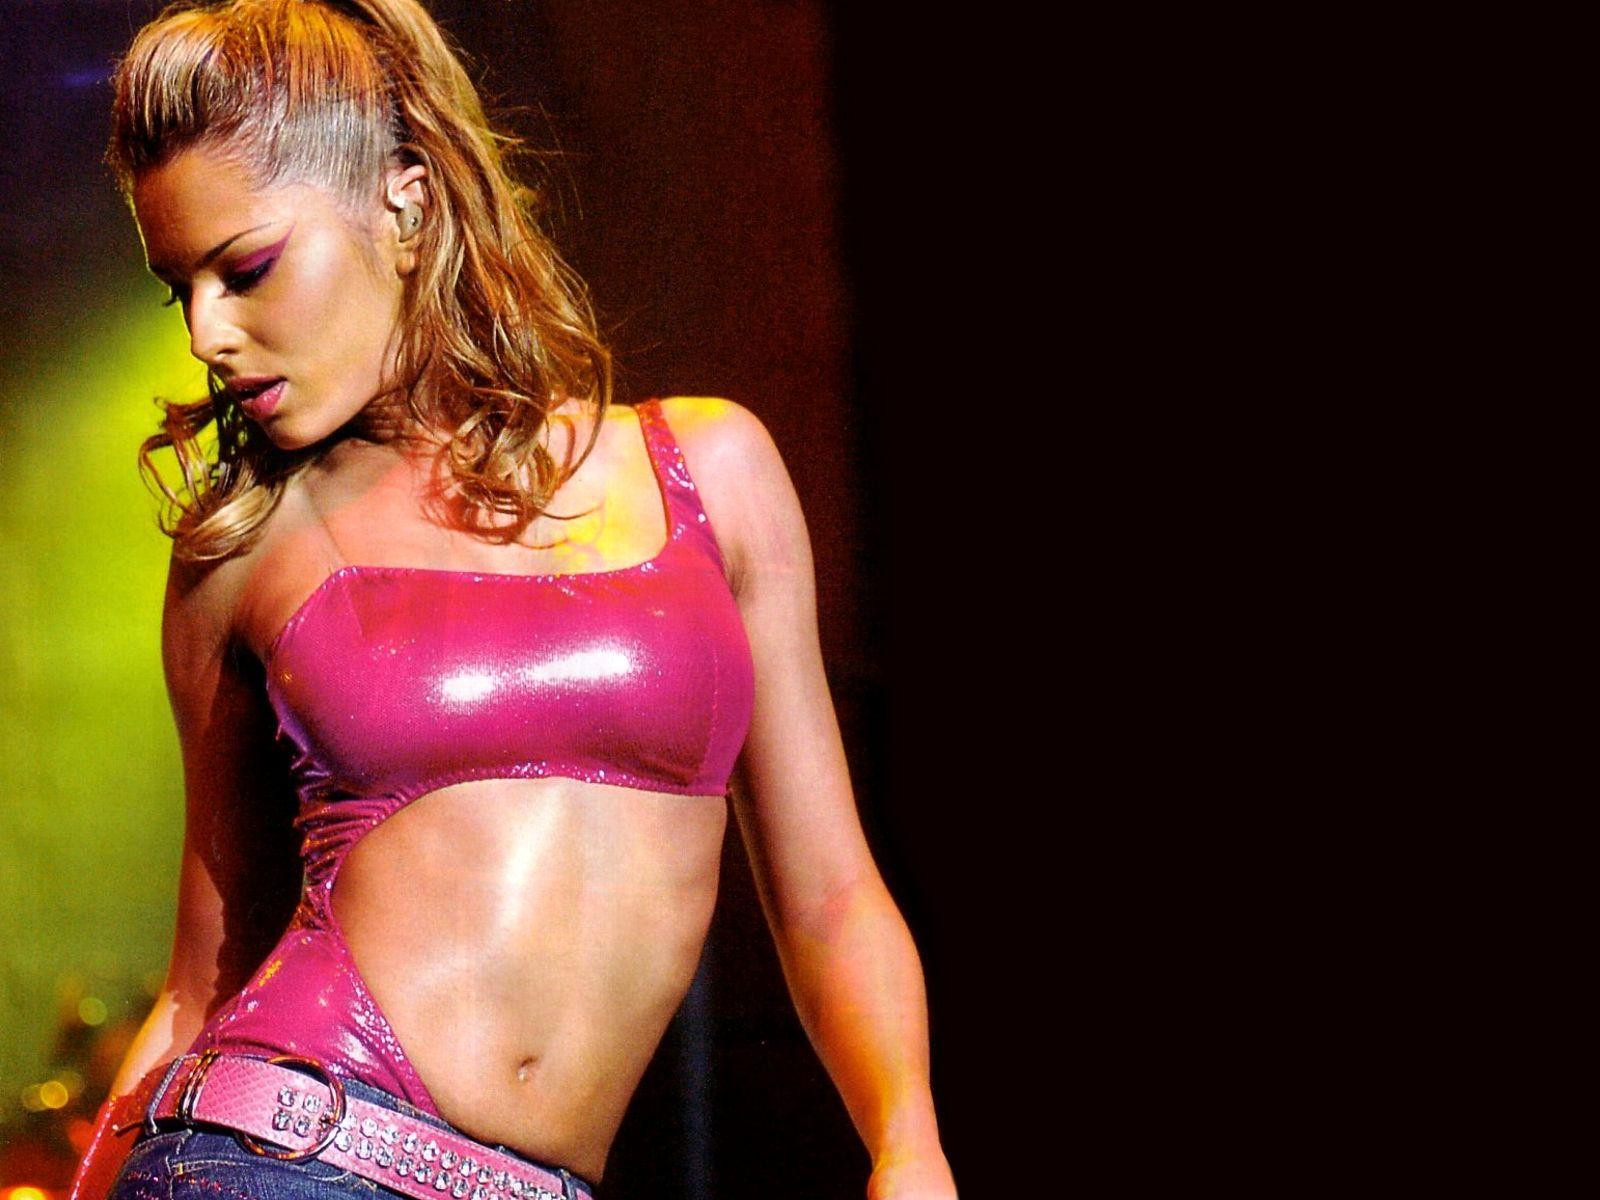 Cheryl Cole Seducing Hot Pics 2016 in pink bikini bra